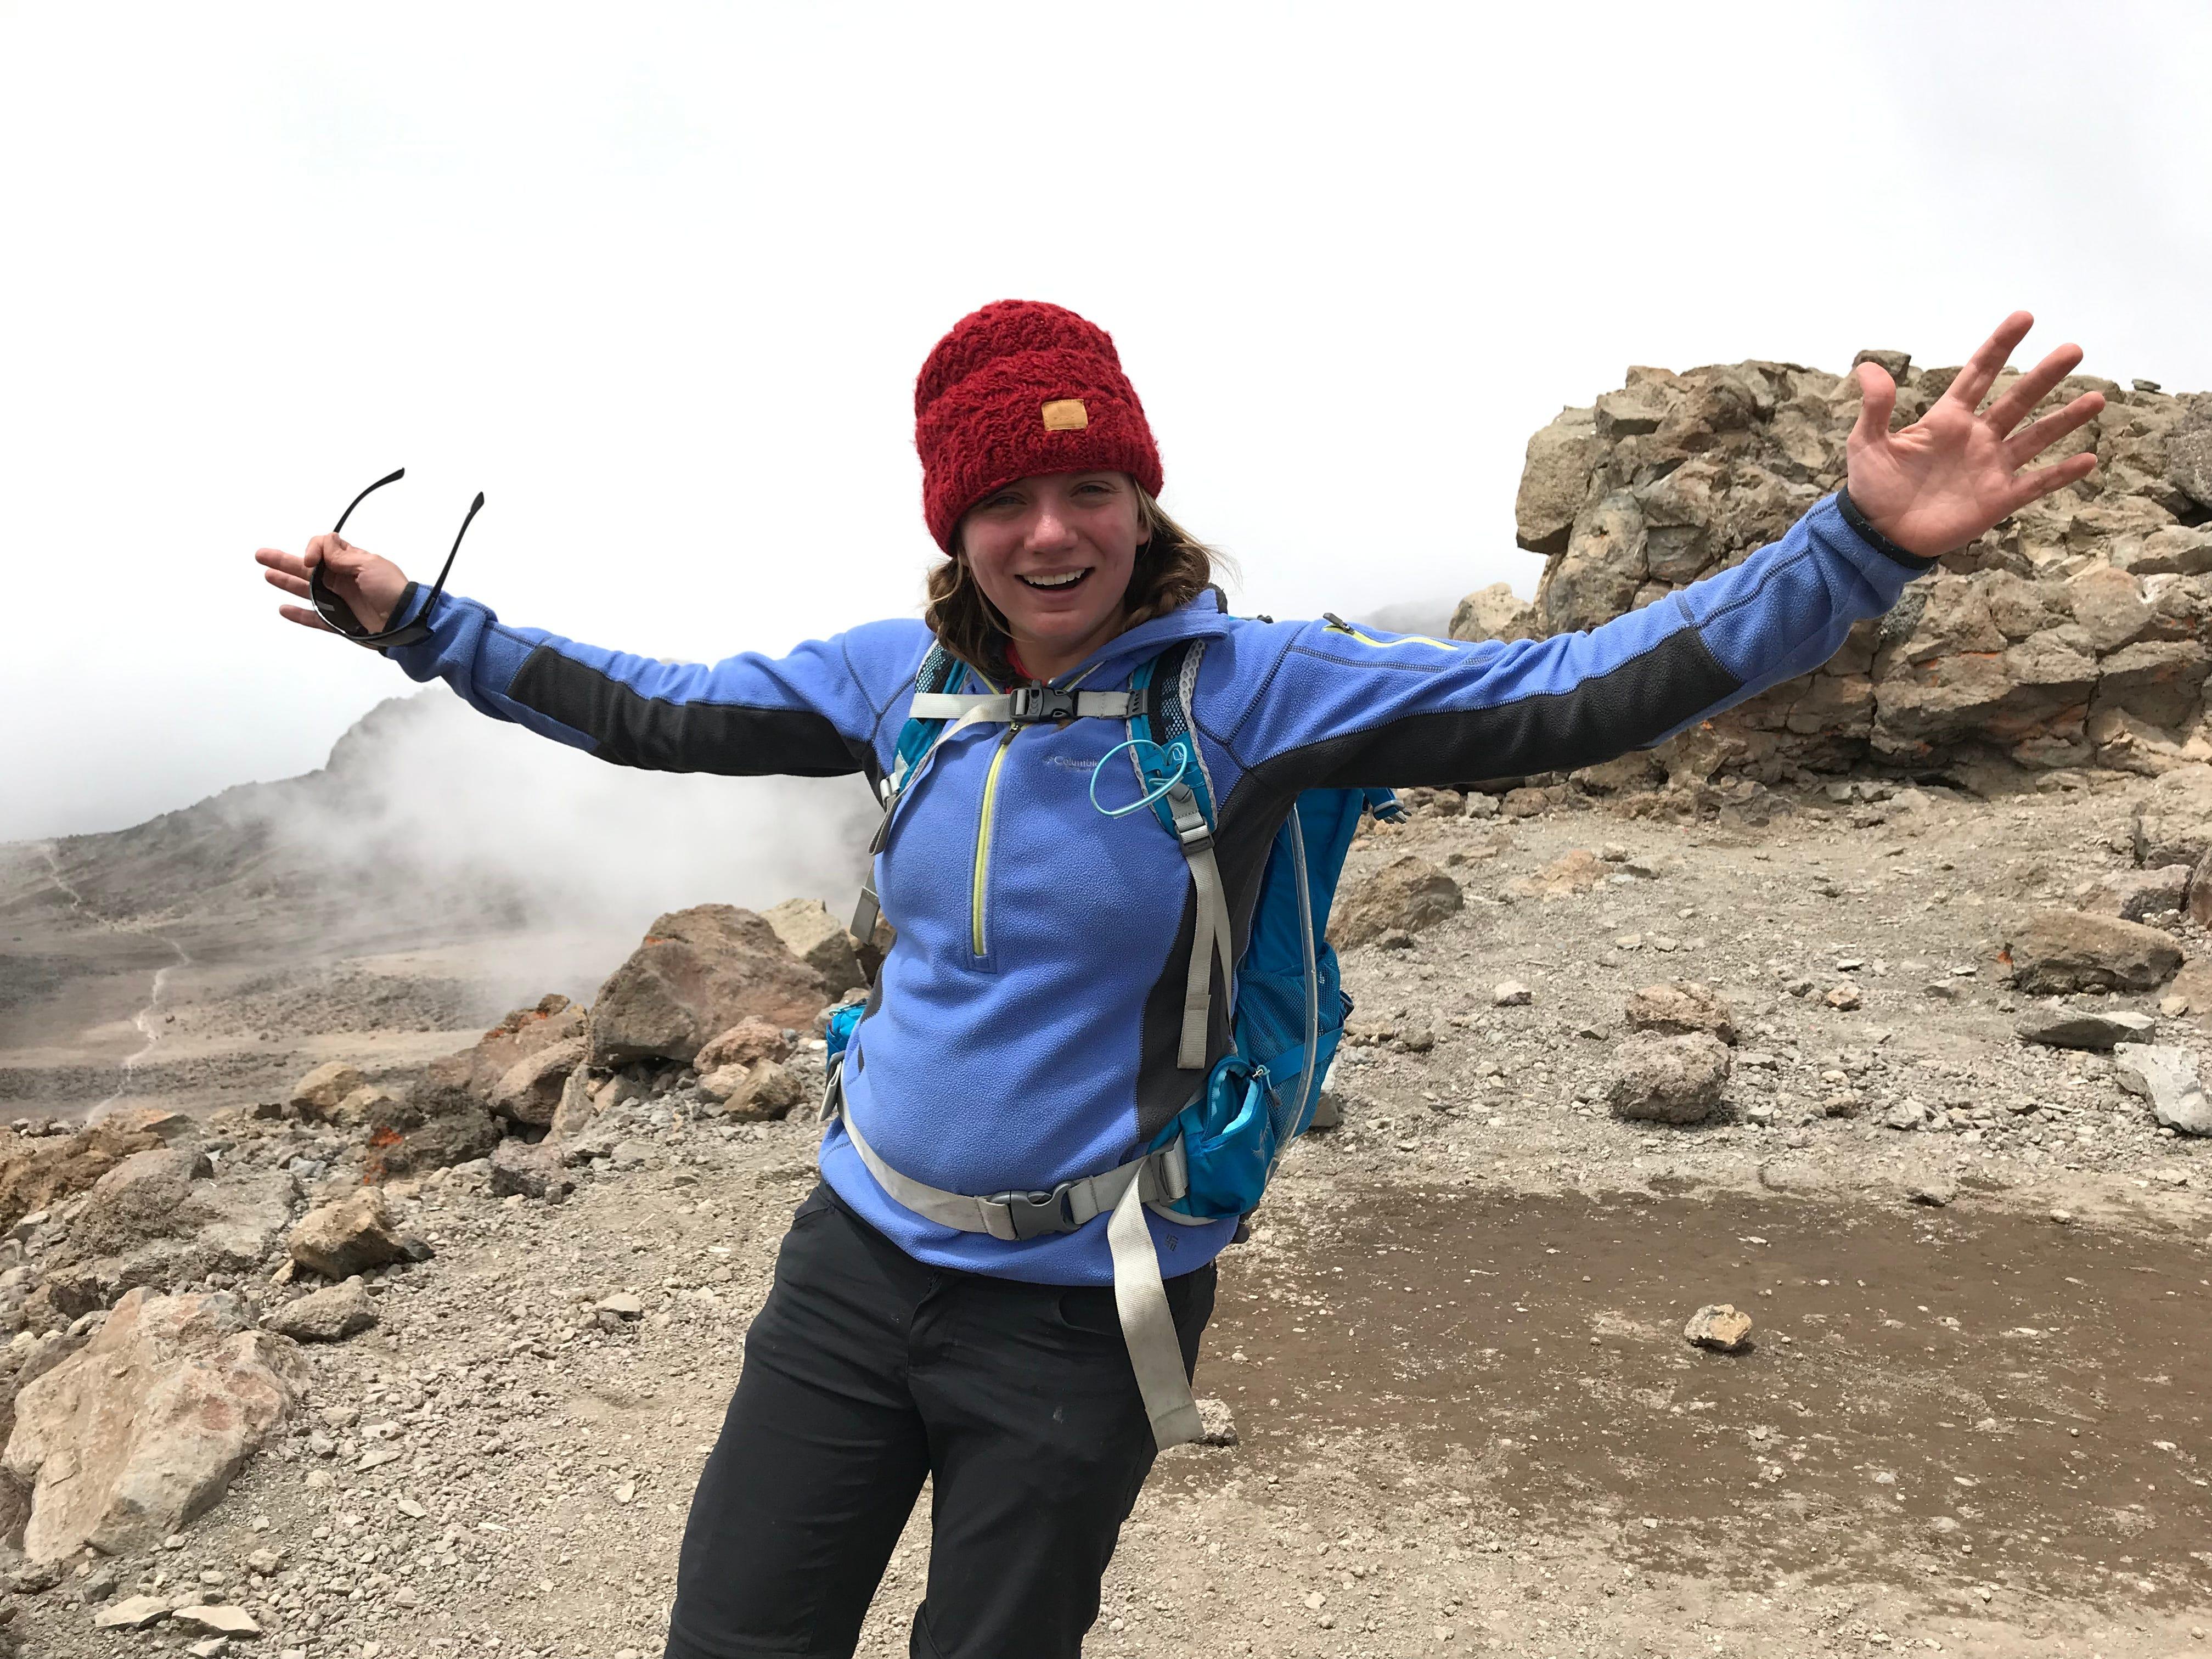 Jordan Grantz after summitting Mount Kilimanjaro, Tanzania